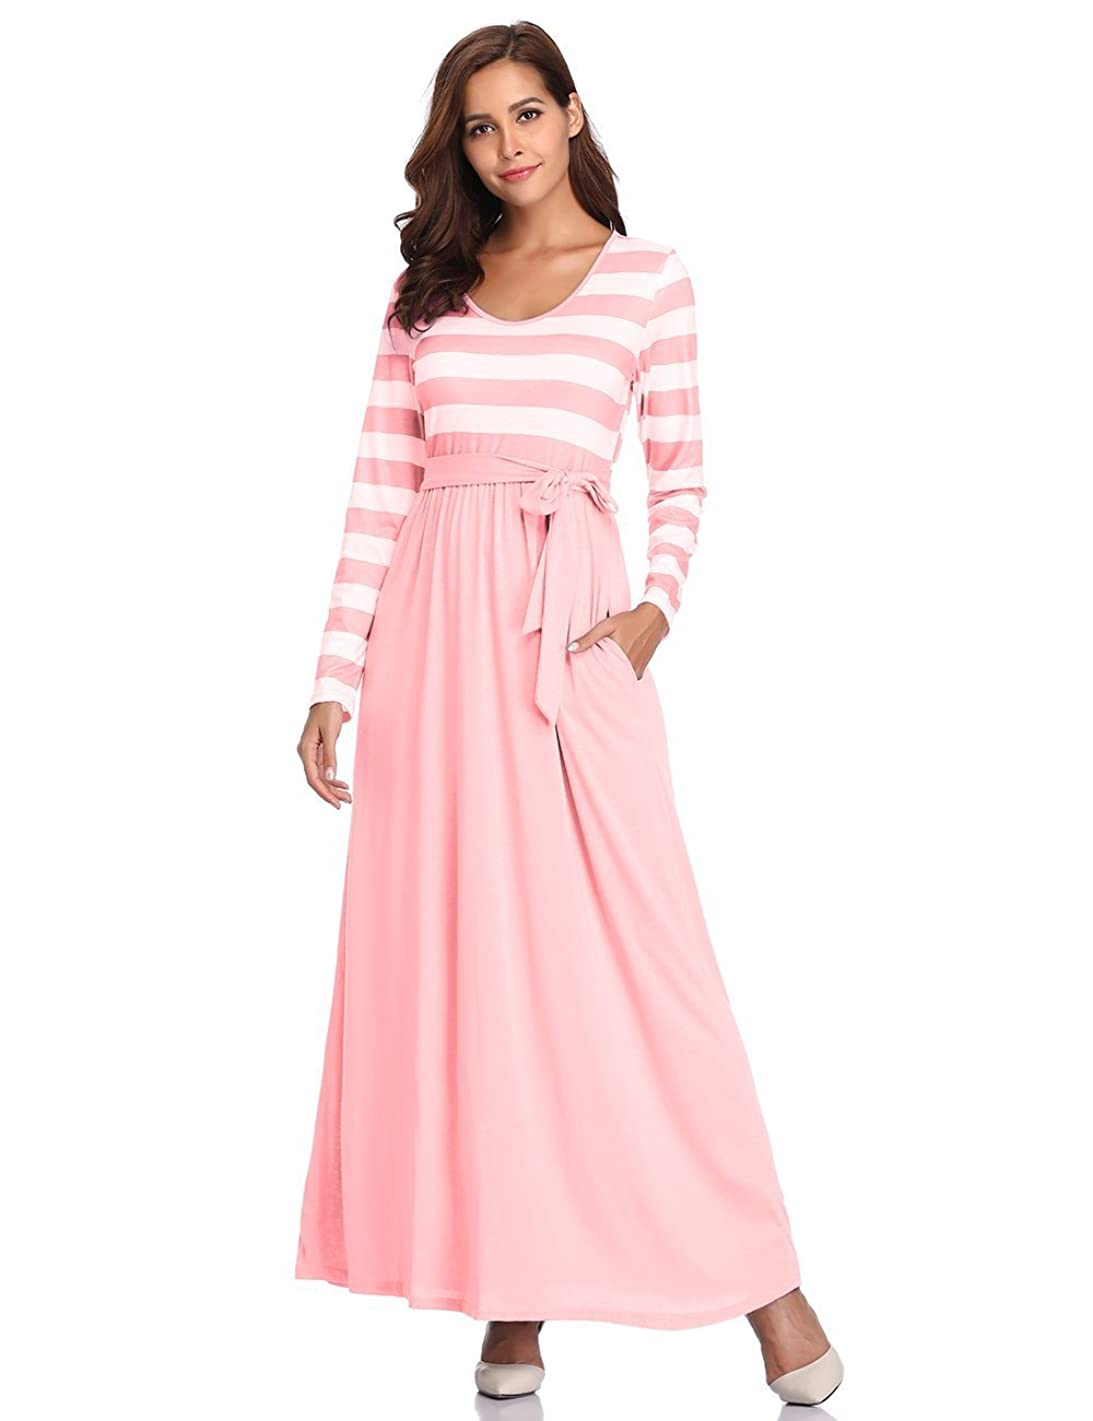 CROSS1946 Womens Casual Striped Scoop Neck Long Sleeve Tie Waist Pockets Maxi Dress